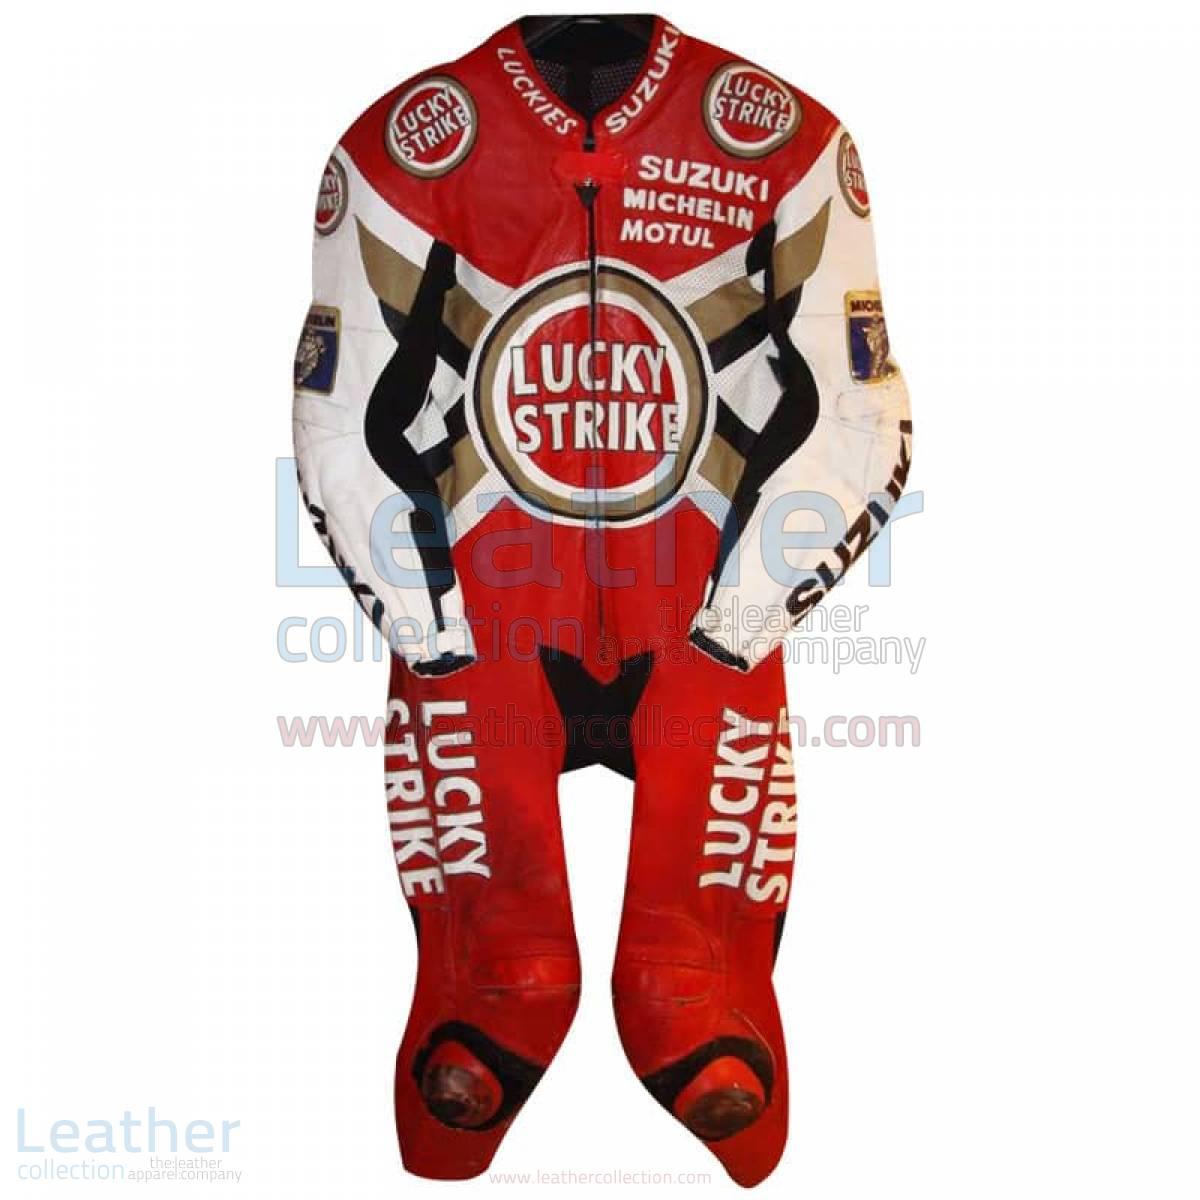 Anthony Gobert Suzuki Lucky Strike 1997 MotoGP Leathers – Suzuki Suit